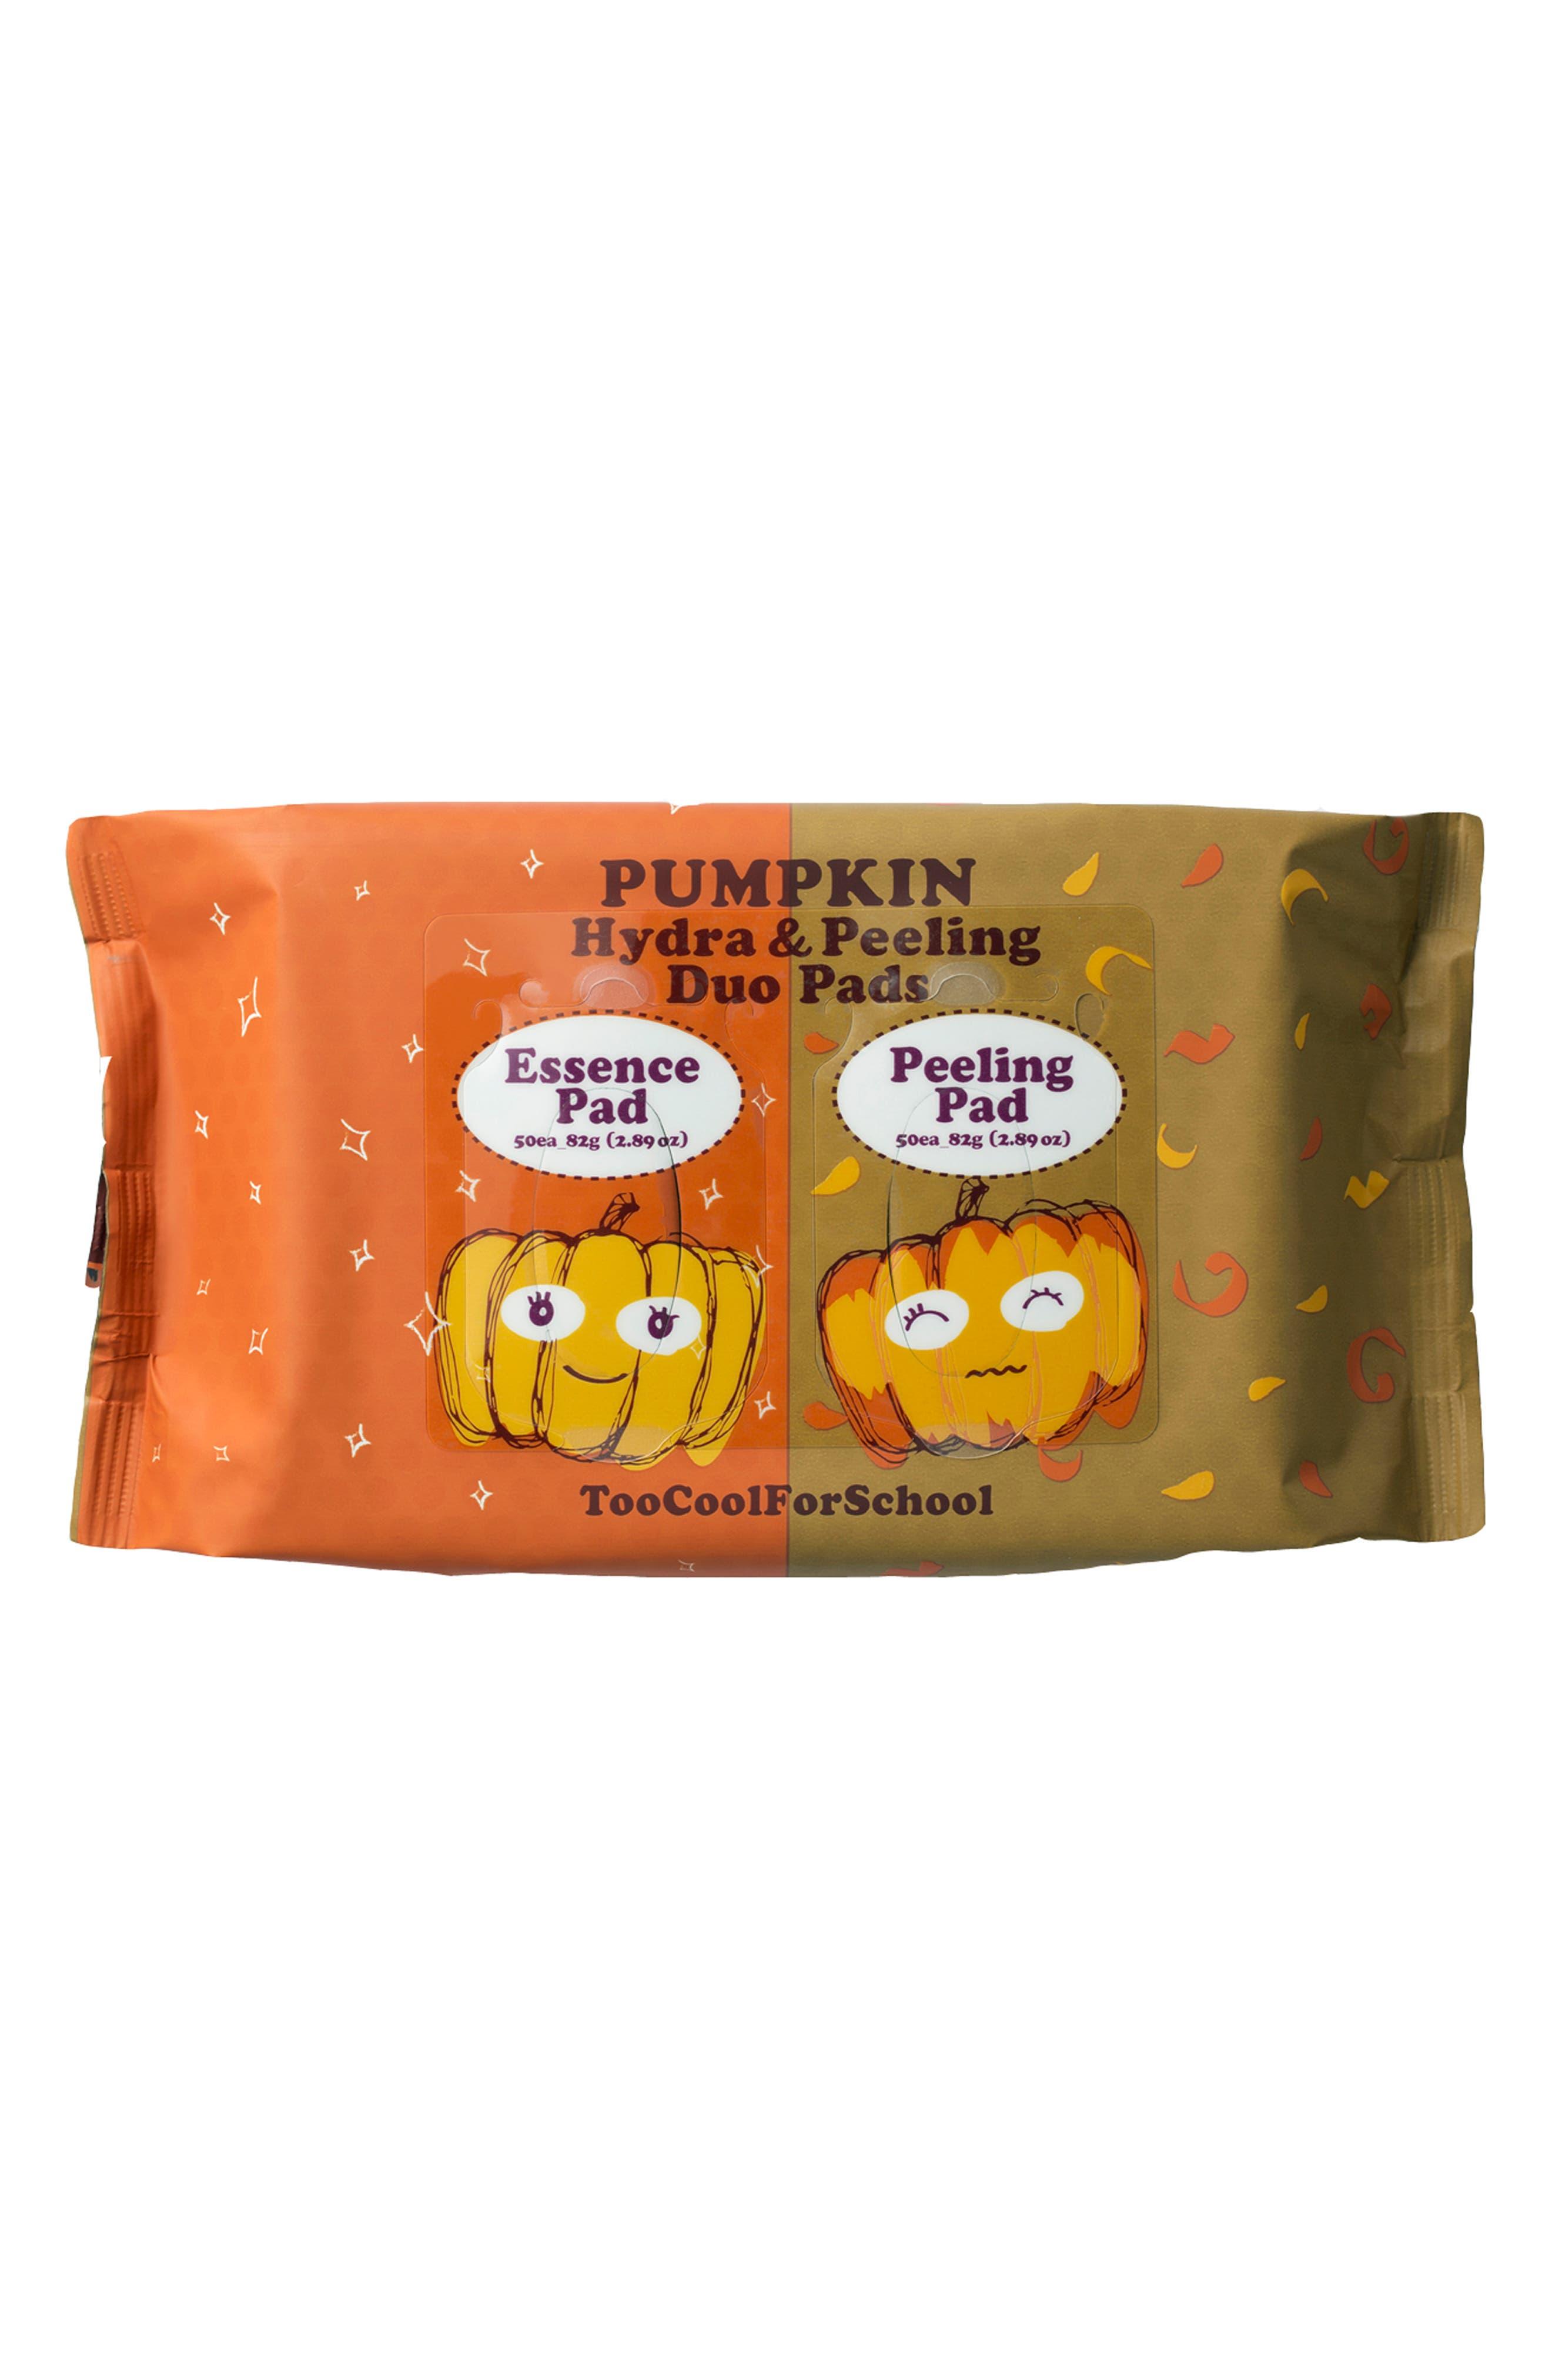 Pumpkin Hydra & Peeling Duo Pads,                             Main thumbnail 1, color,                             NO COLOR